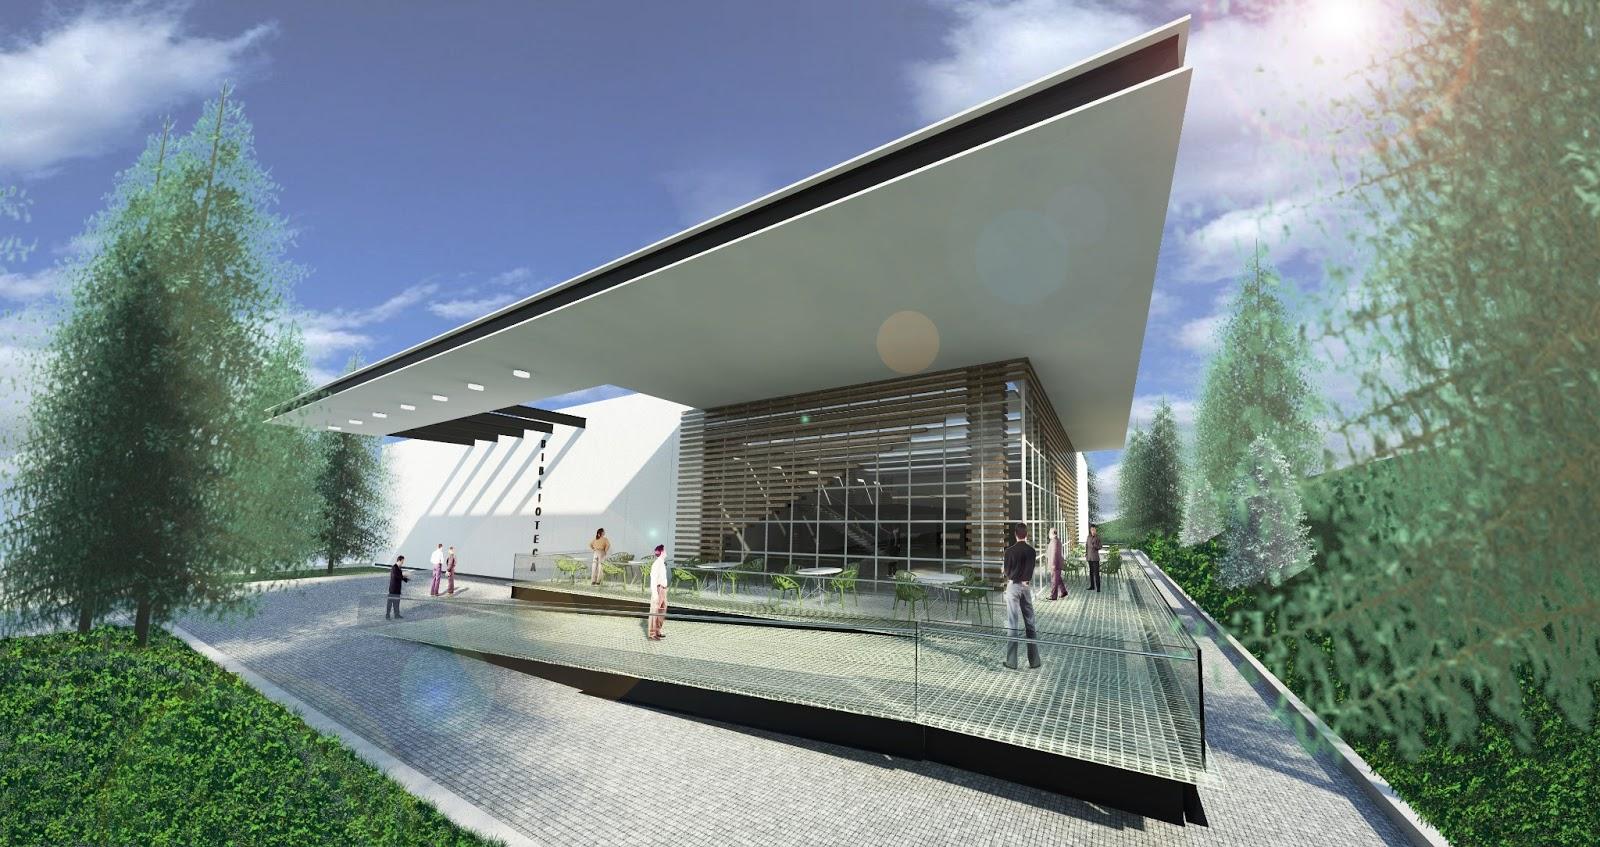 Biblioteca esia tecamachalco 2m arquitectos for Biblioteca programa arquitectonico